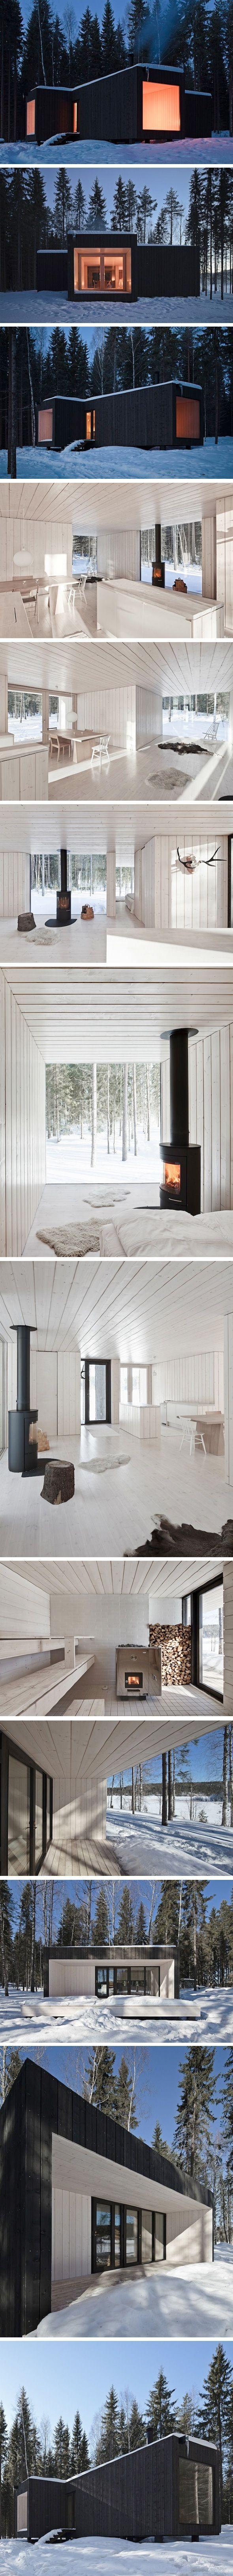 Fourcornered villa par avanto architects villa en croix en finlande